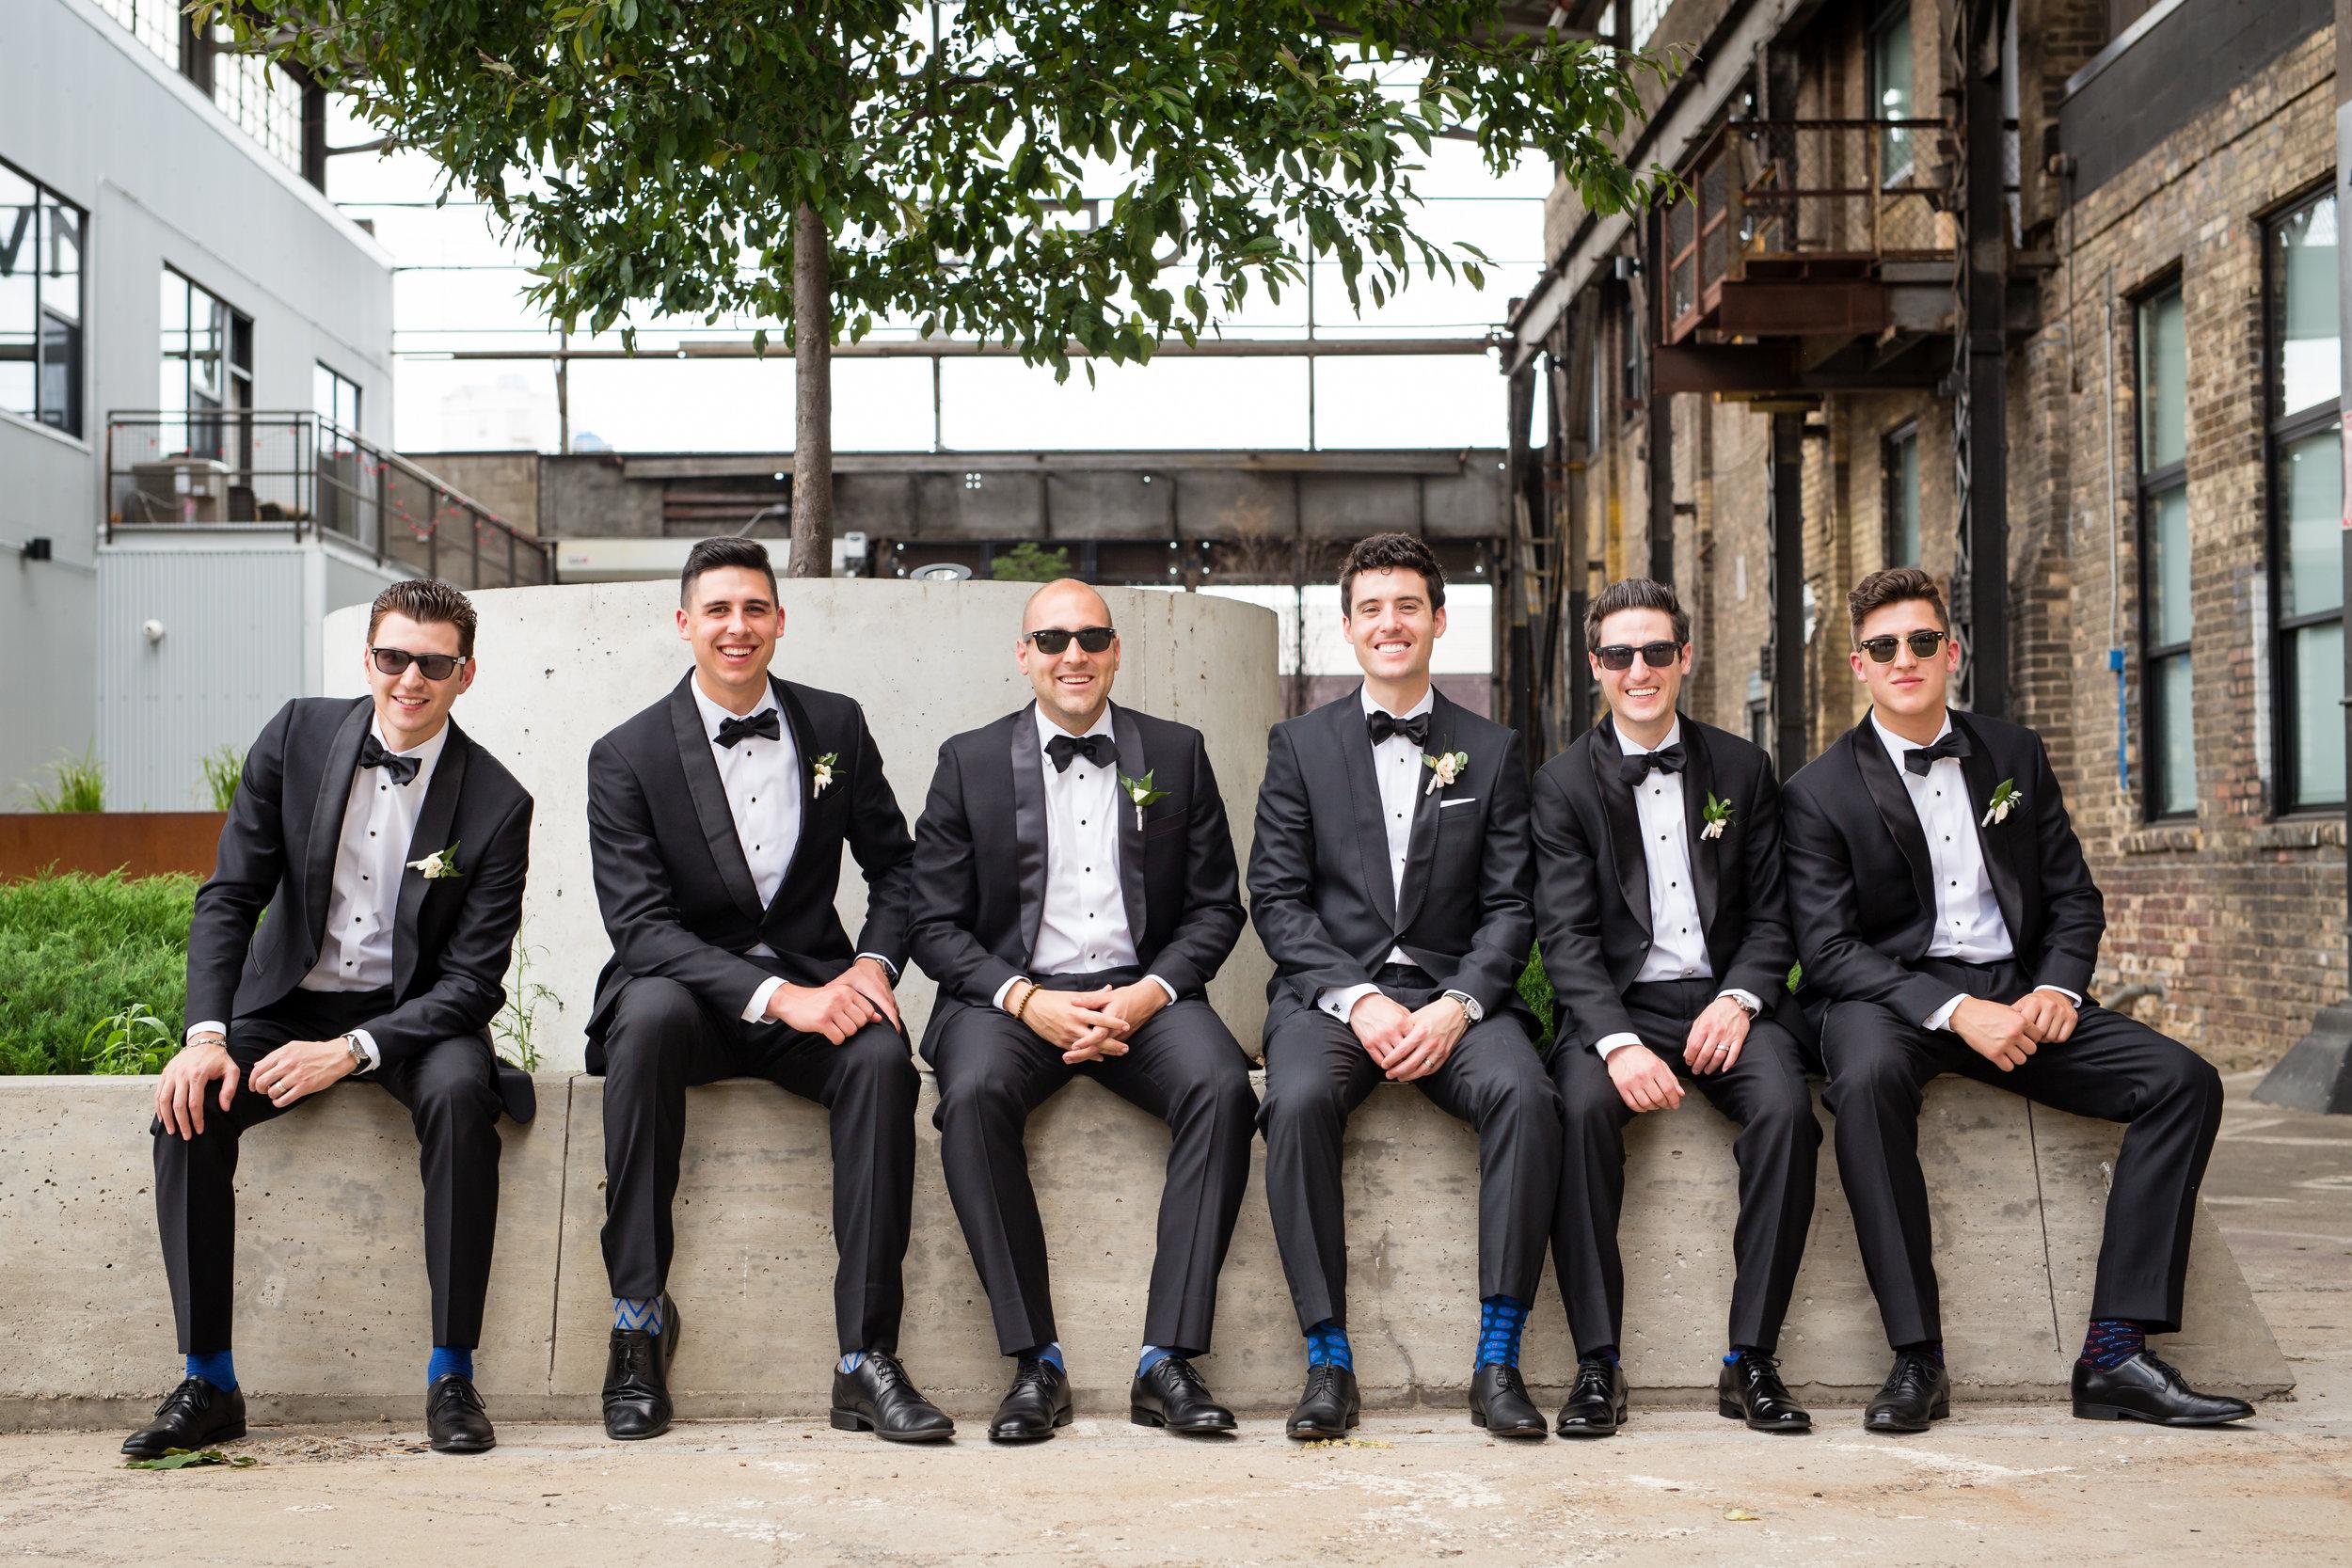 Aversa Wedding 6.10.17-224.JPG